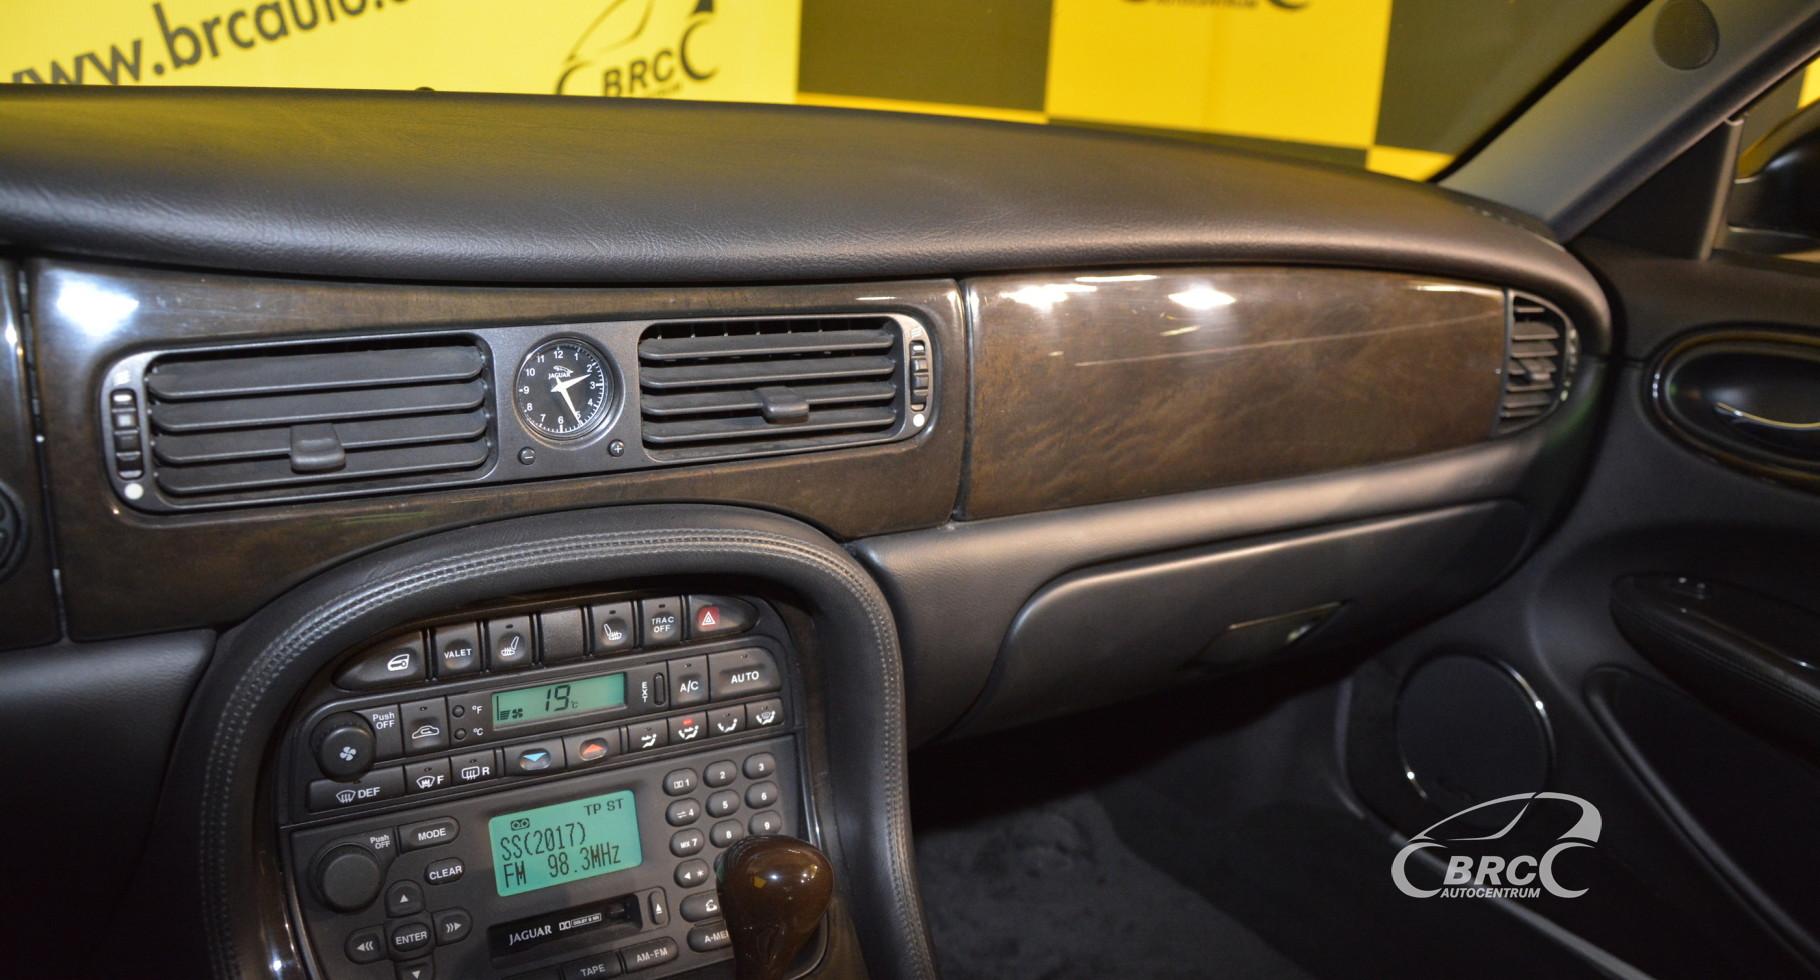 Jaguar XJR 4.0i V8 Supercharged Automatas